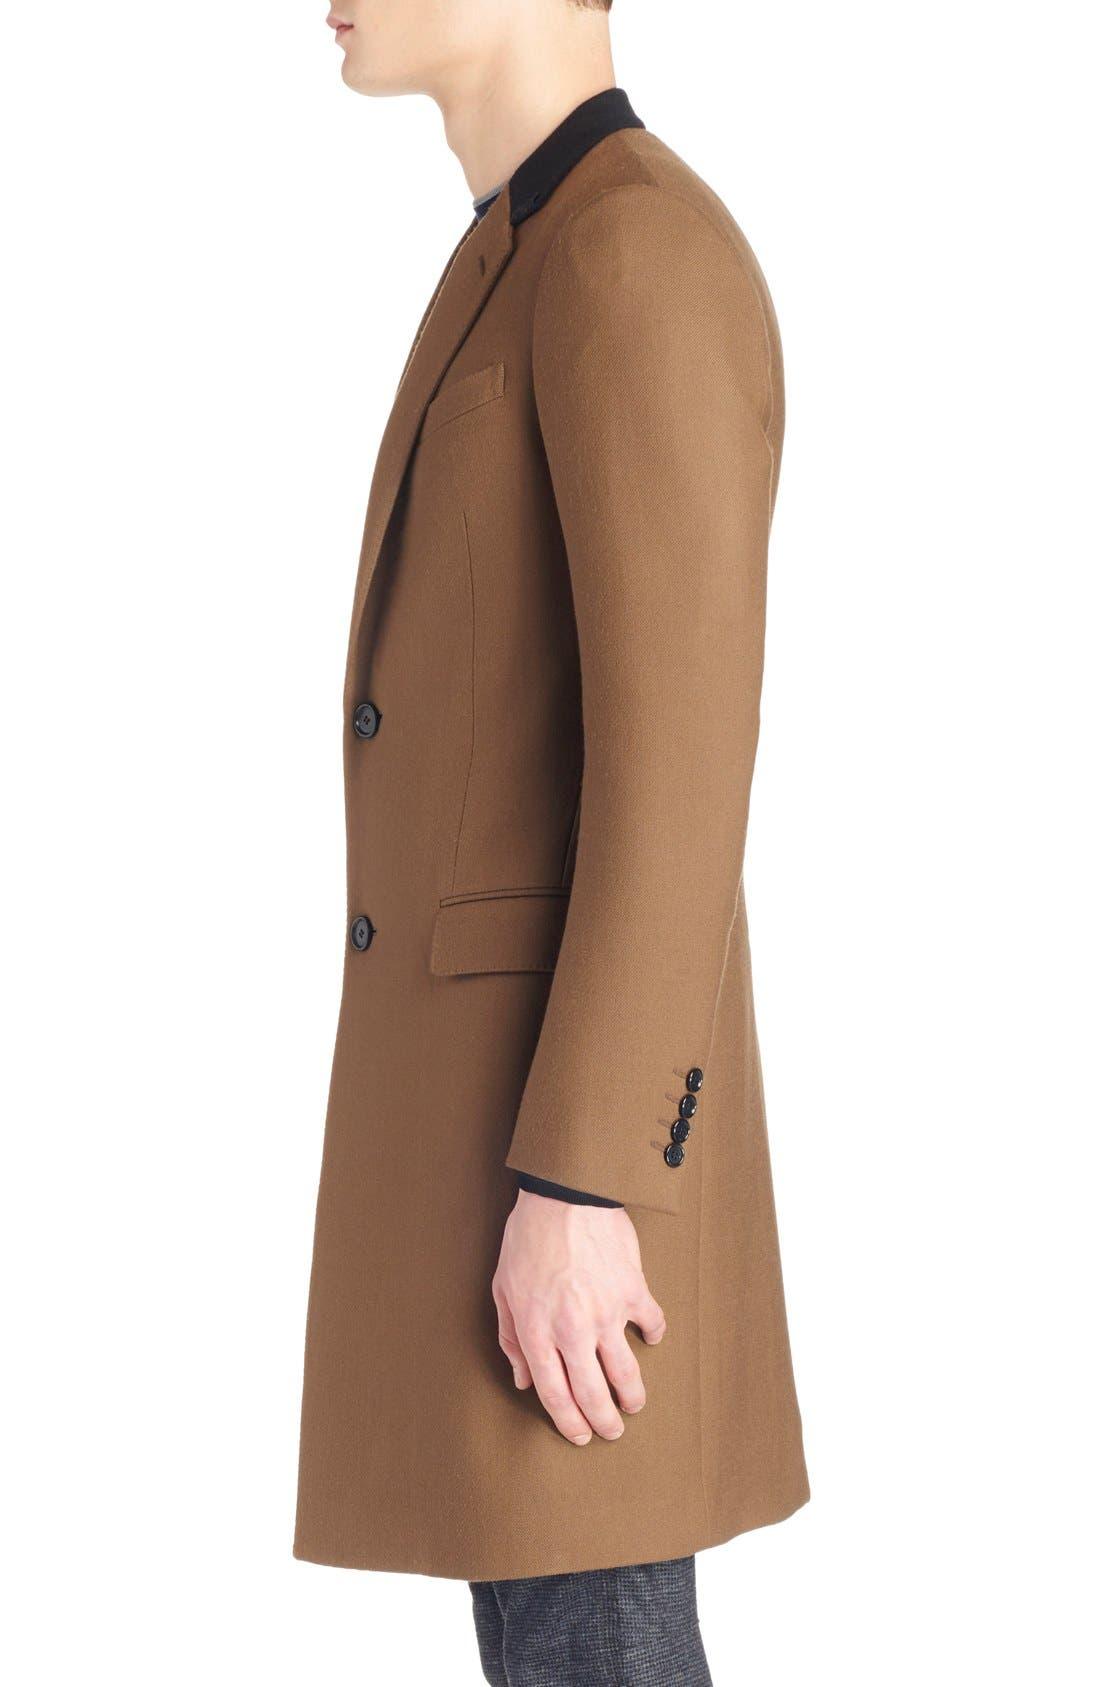 LANVIN, Wool Overcoat, Alternate thumbnail 4, color, 230